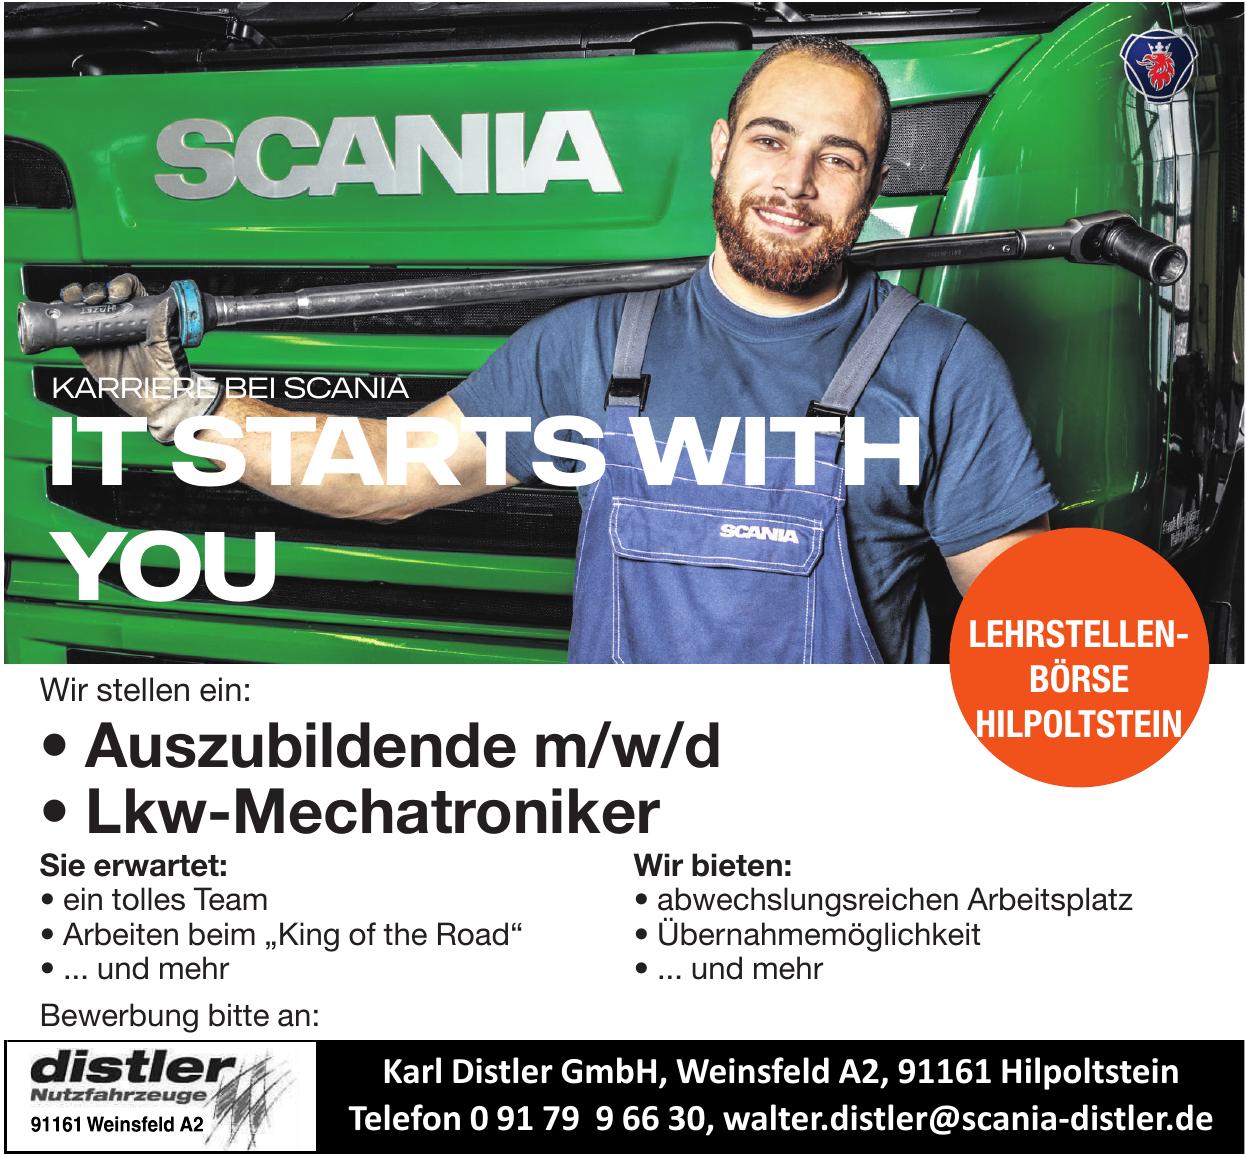 Karl Distler GmbH